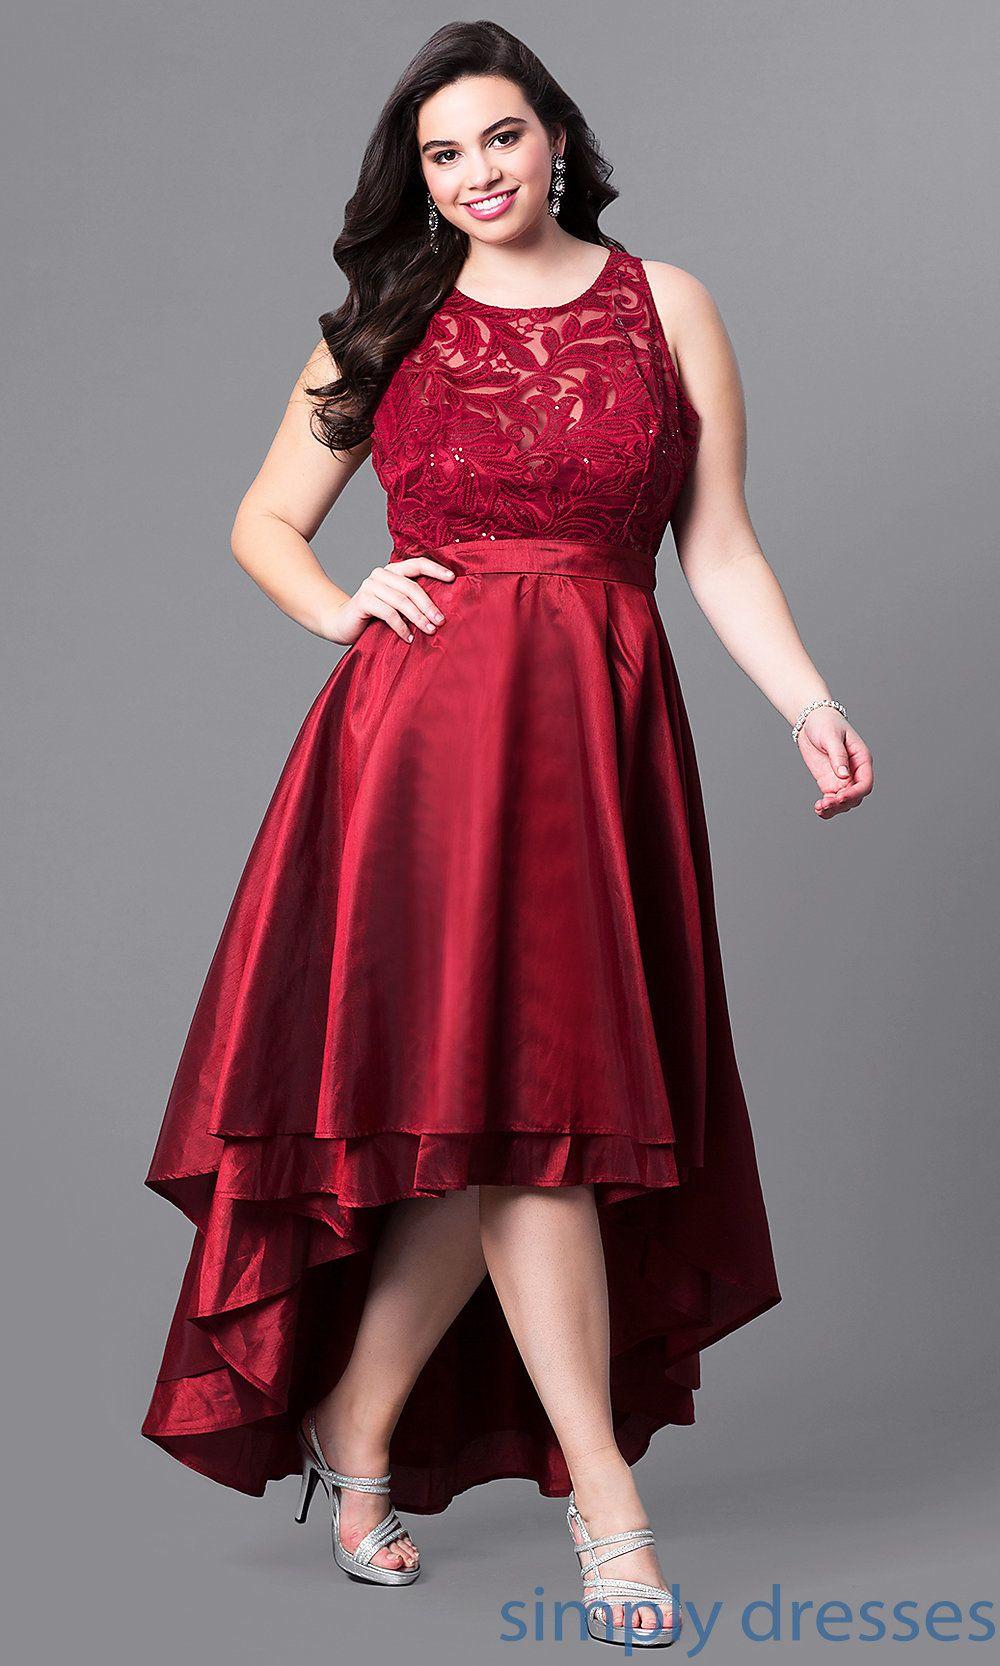 Pin on Western dress